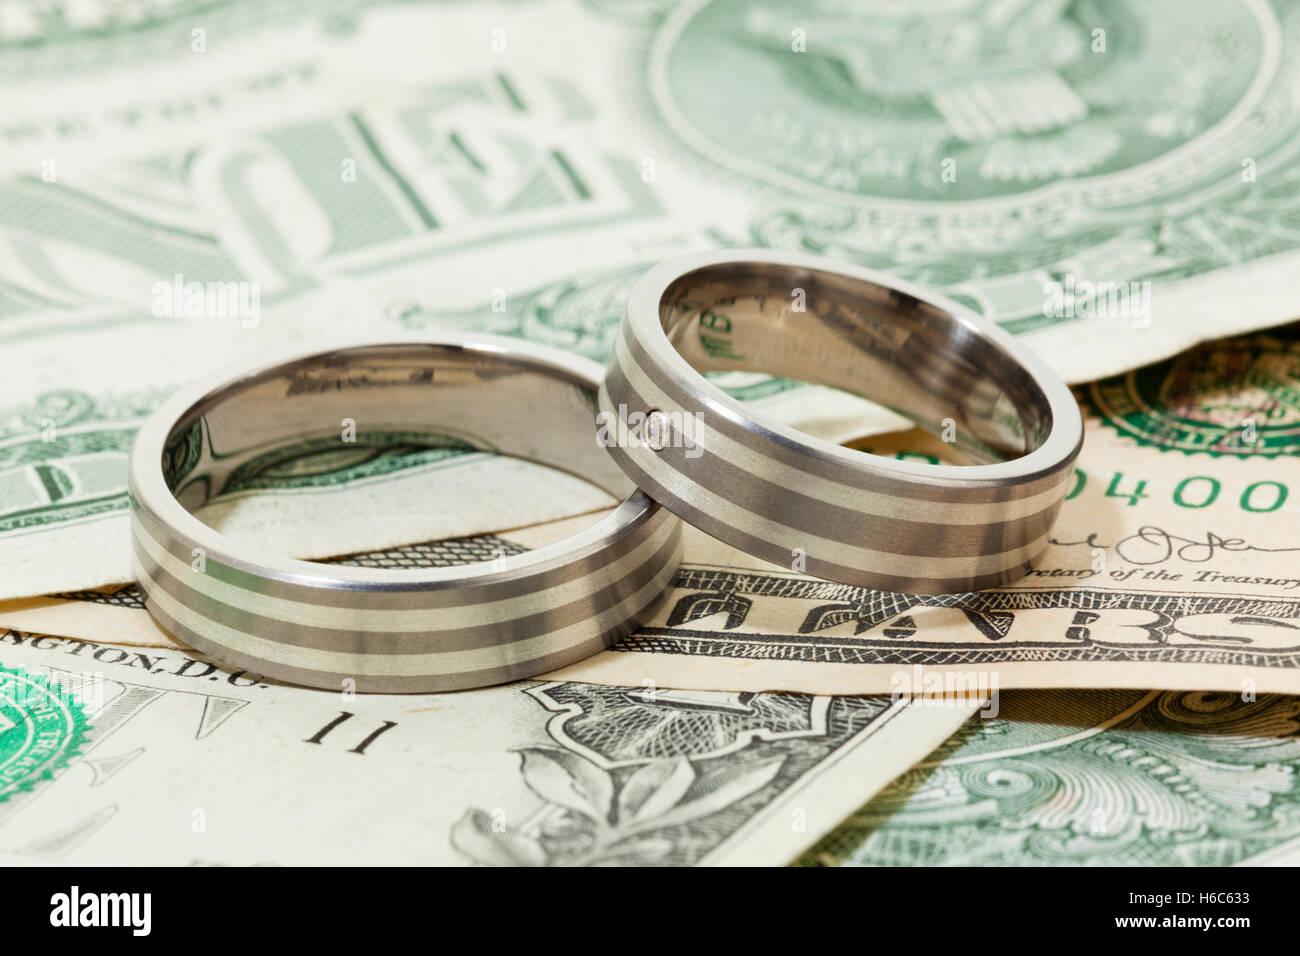 Pair of engagement or wedding rings on dollar bills - Stock Image